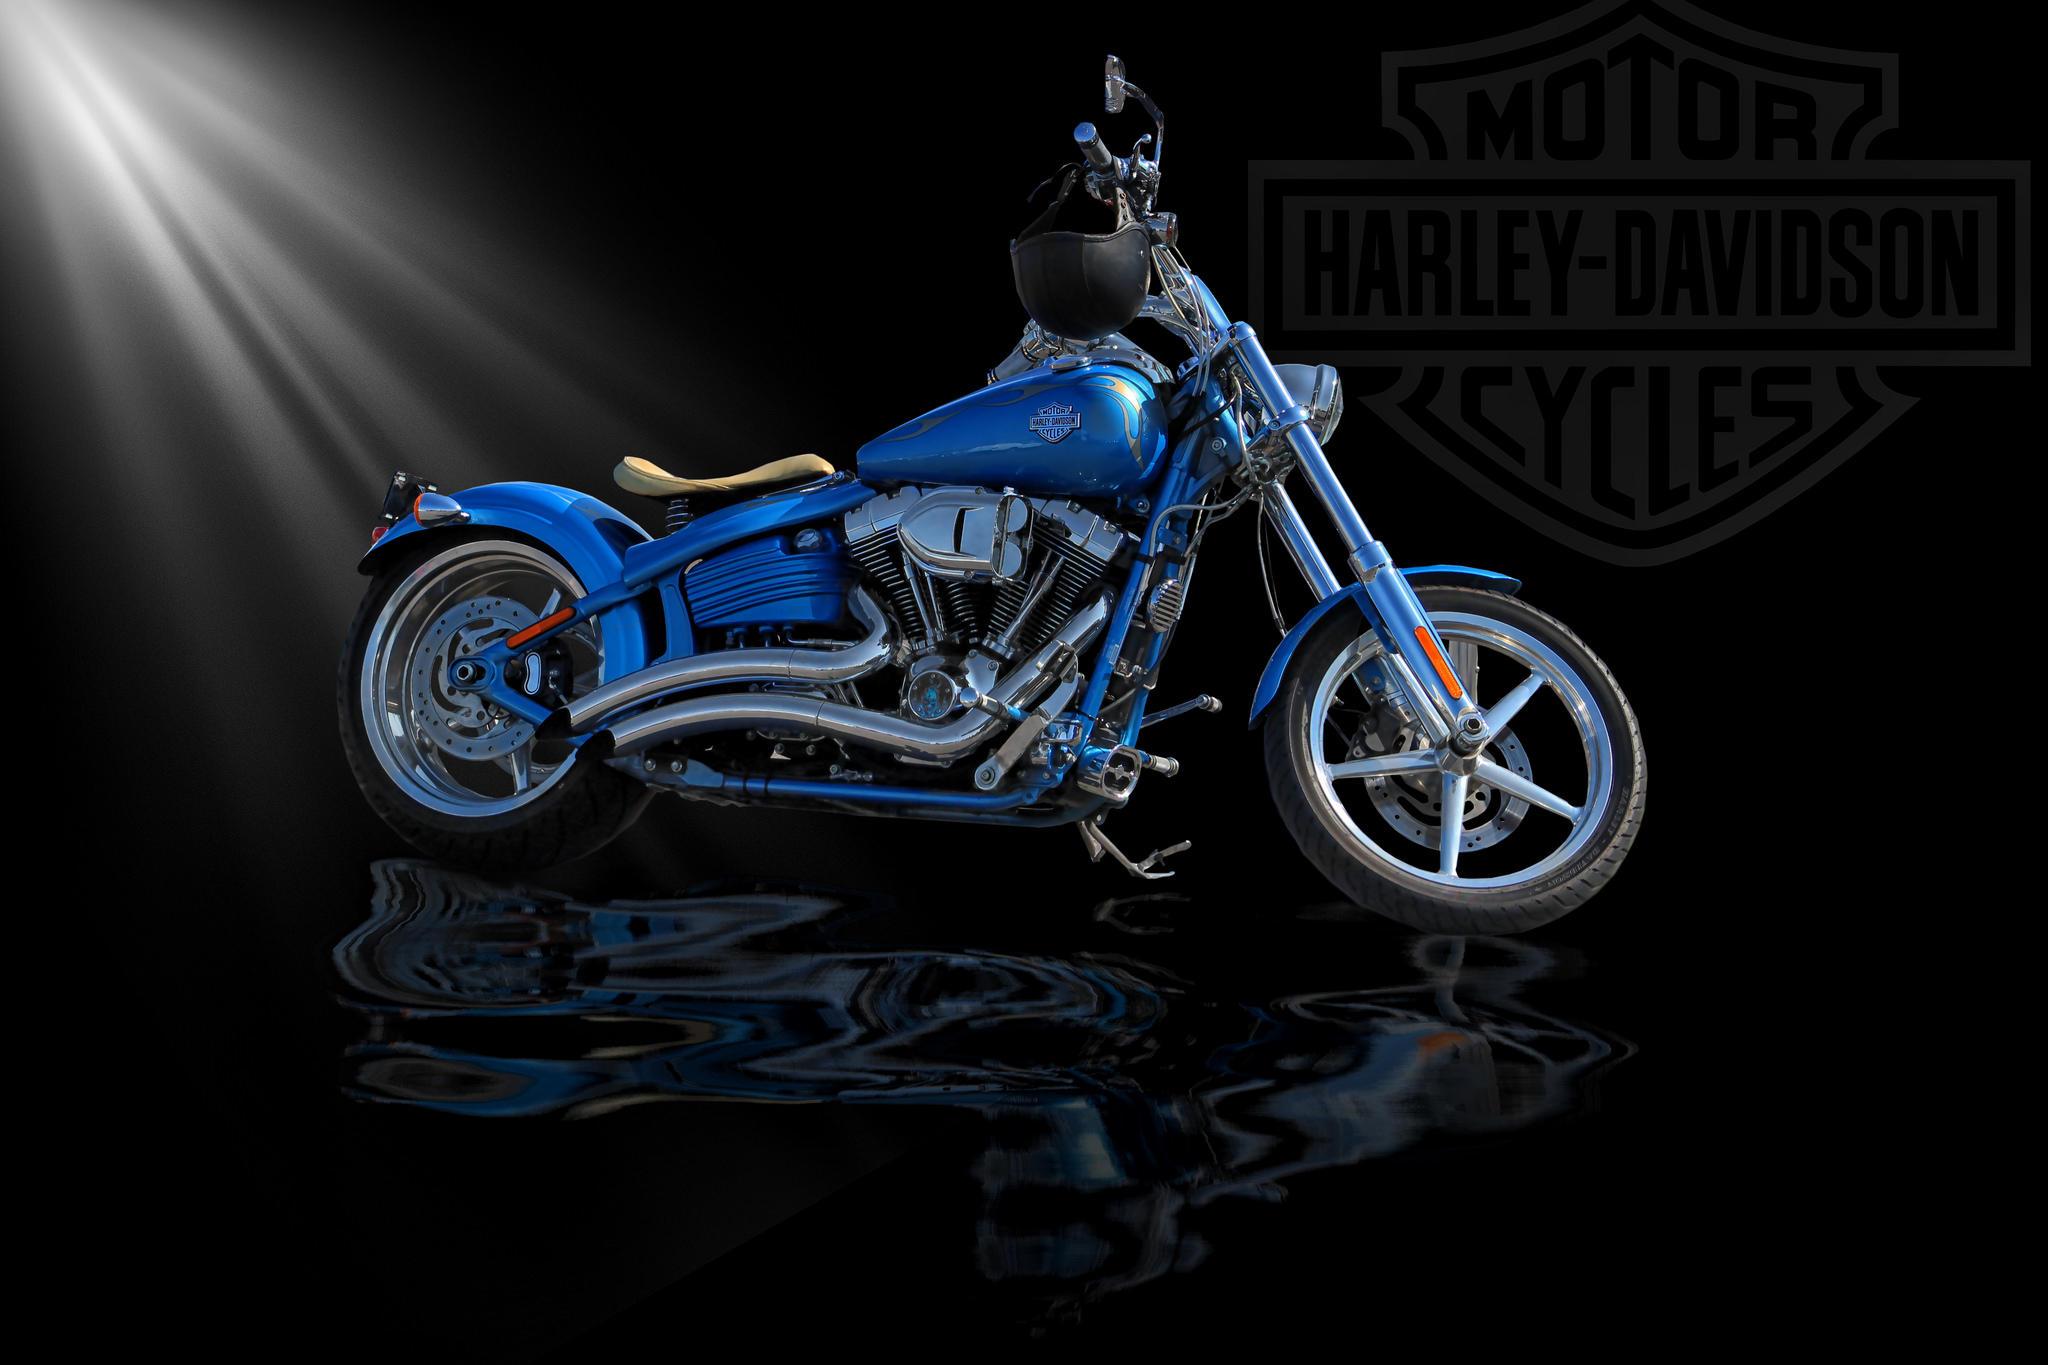 Обои Harley, мотоцикл, харлей дэвидсон